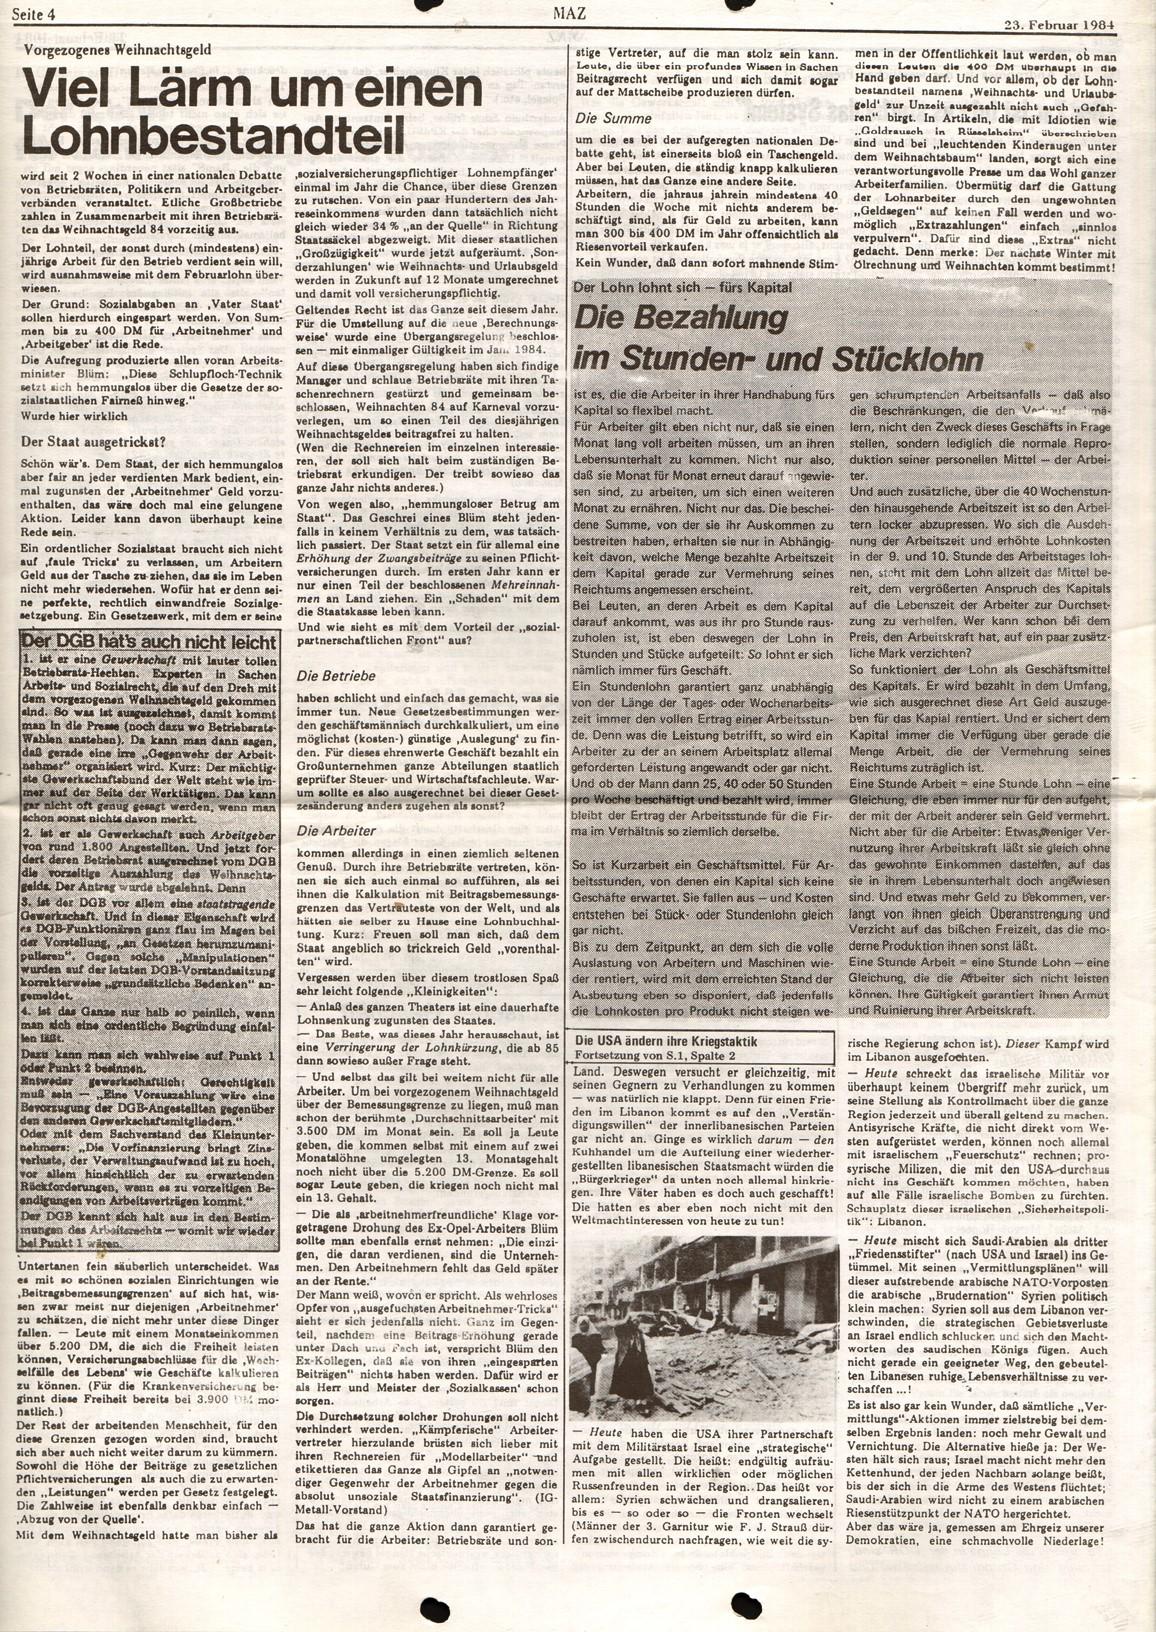 Fuerth_MG_MAZ_Dynamit_Nobel_19840223_04